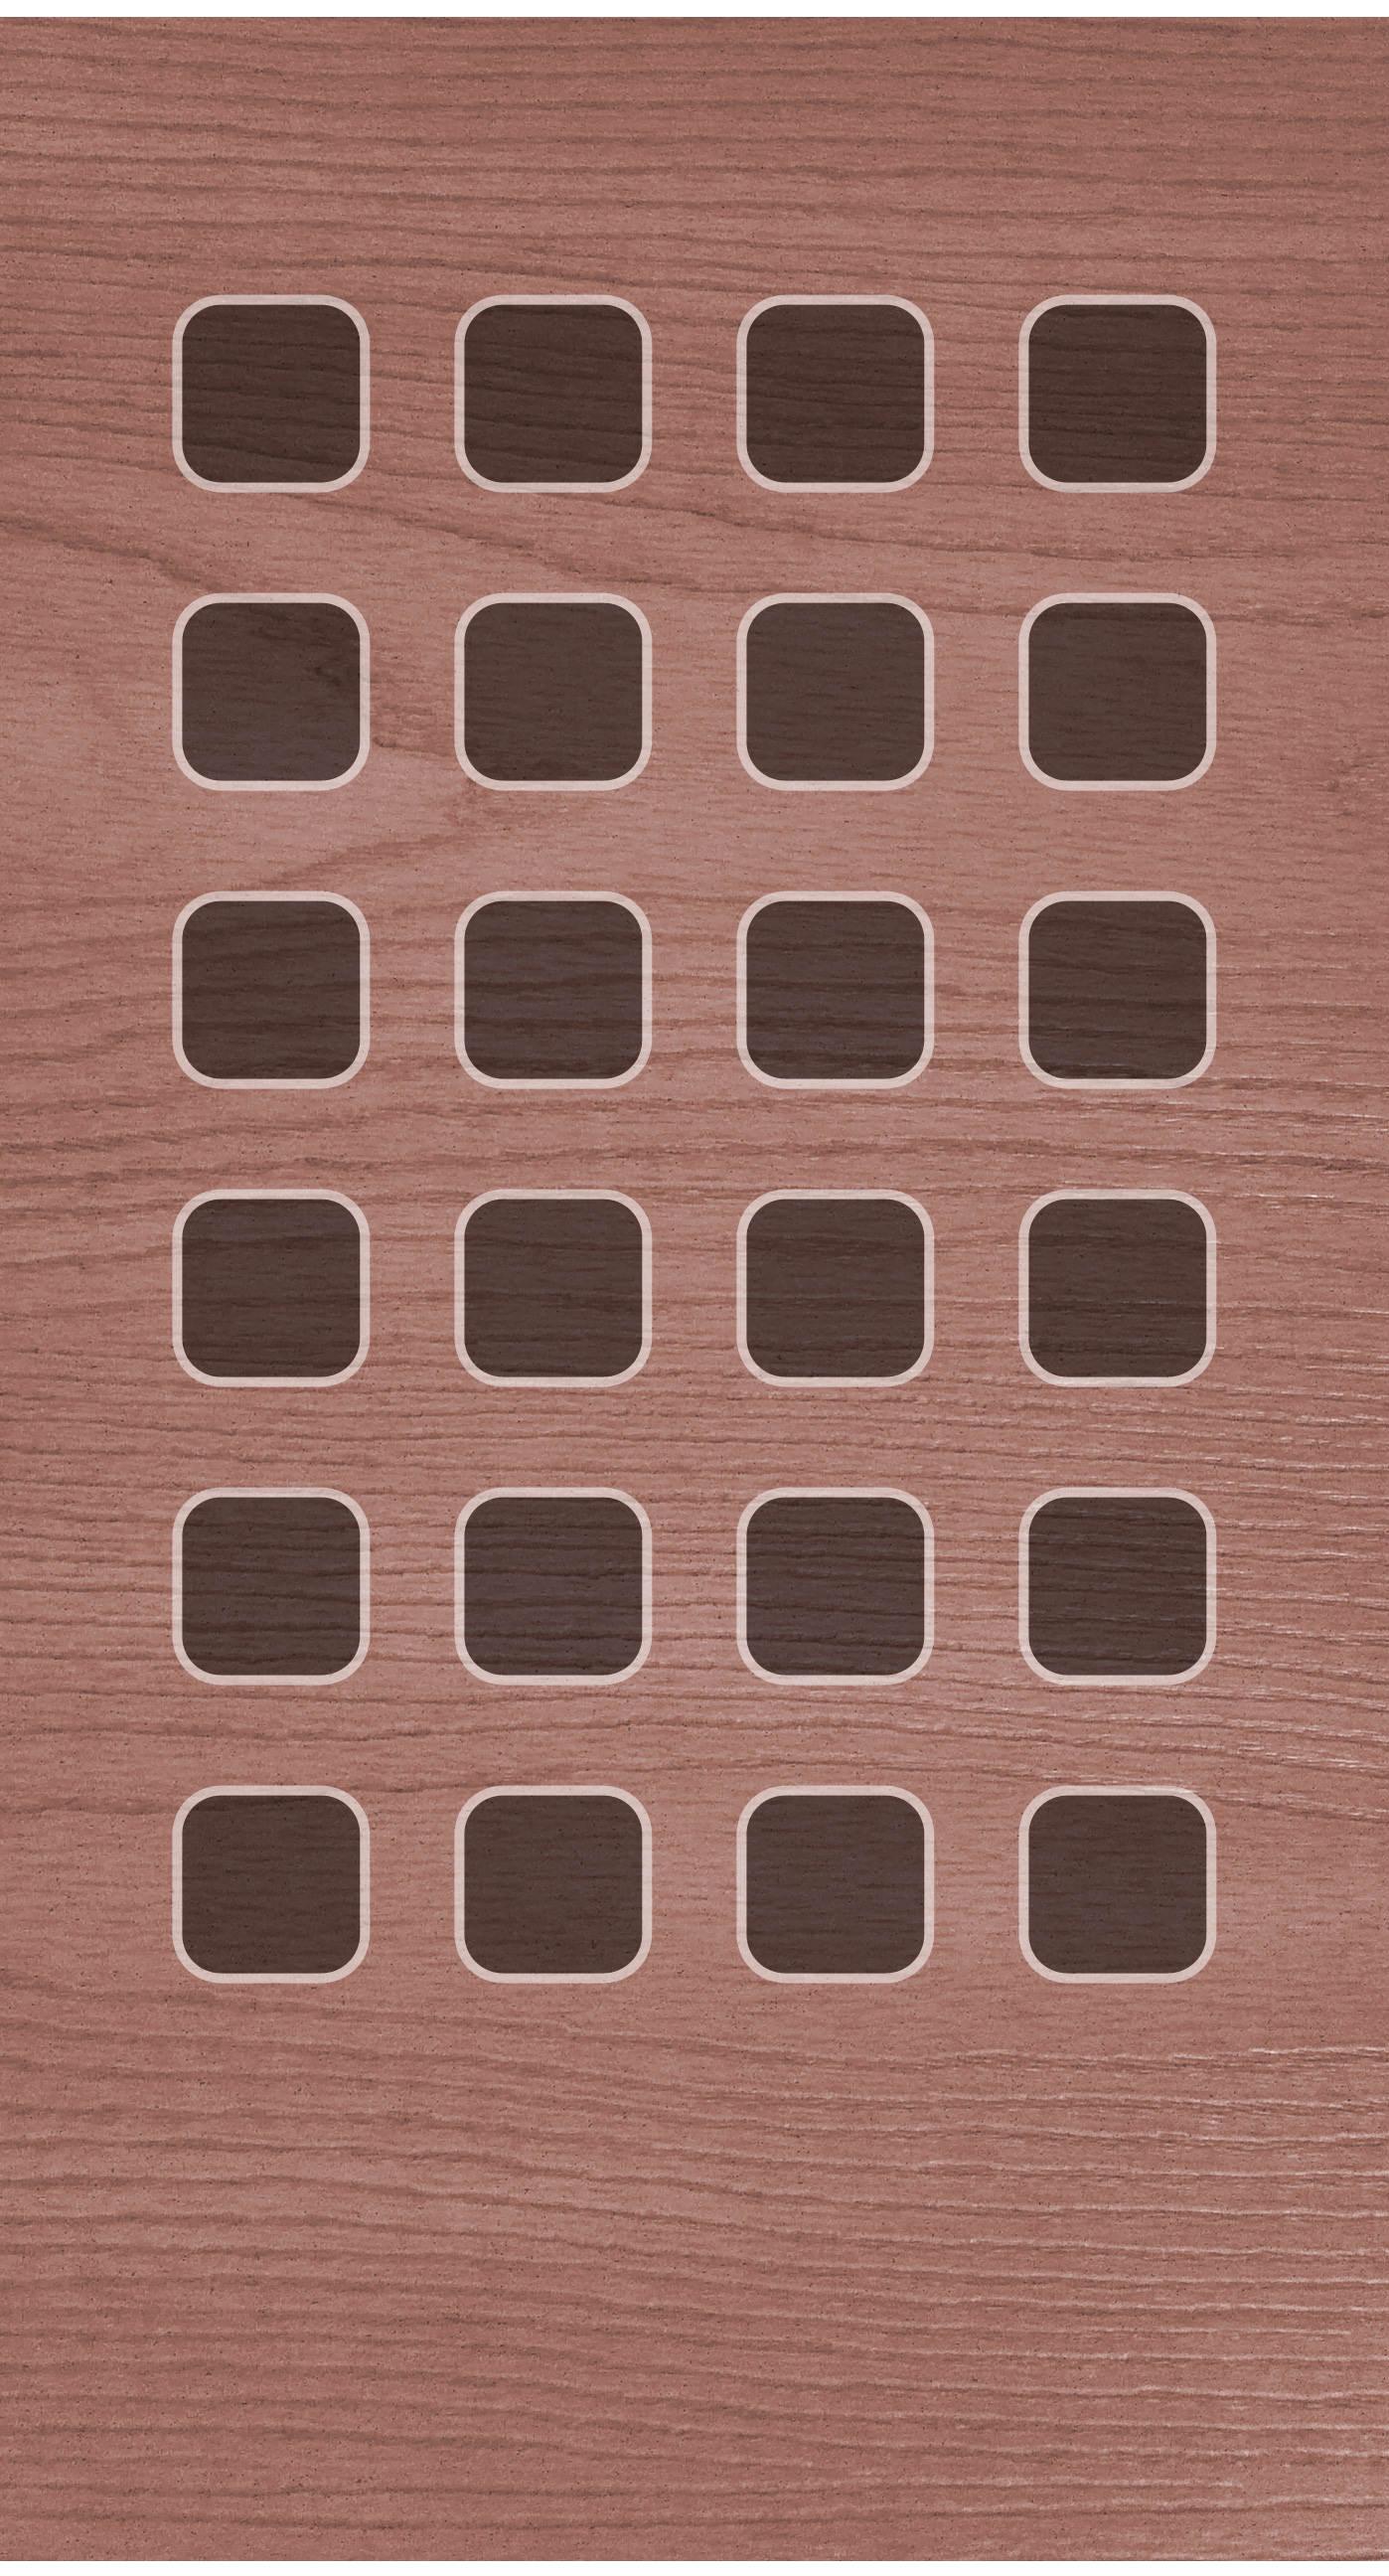 Plate wood brown grain shelf wallpapersc iPhone7Plus 1398x2592